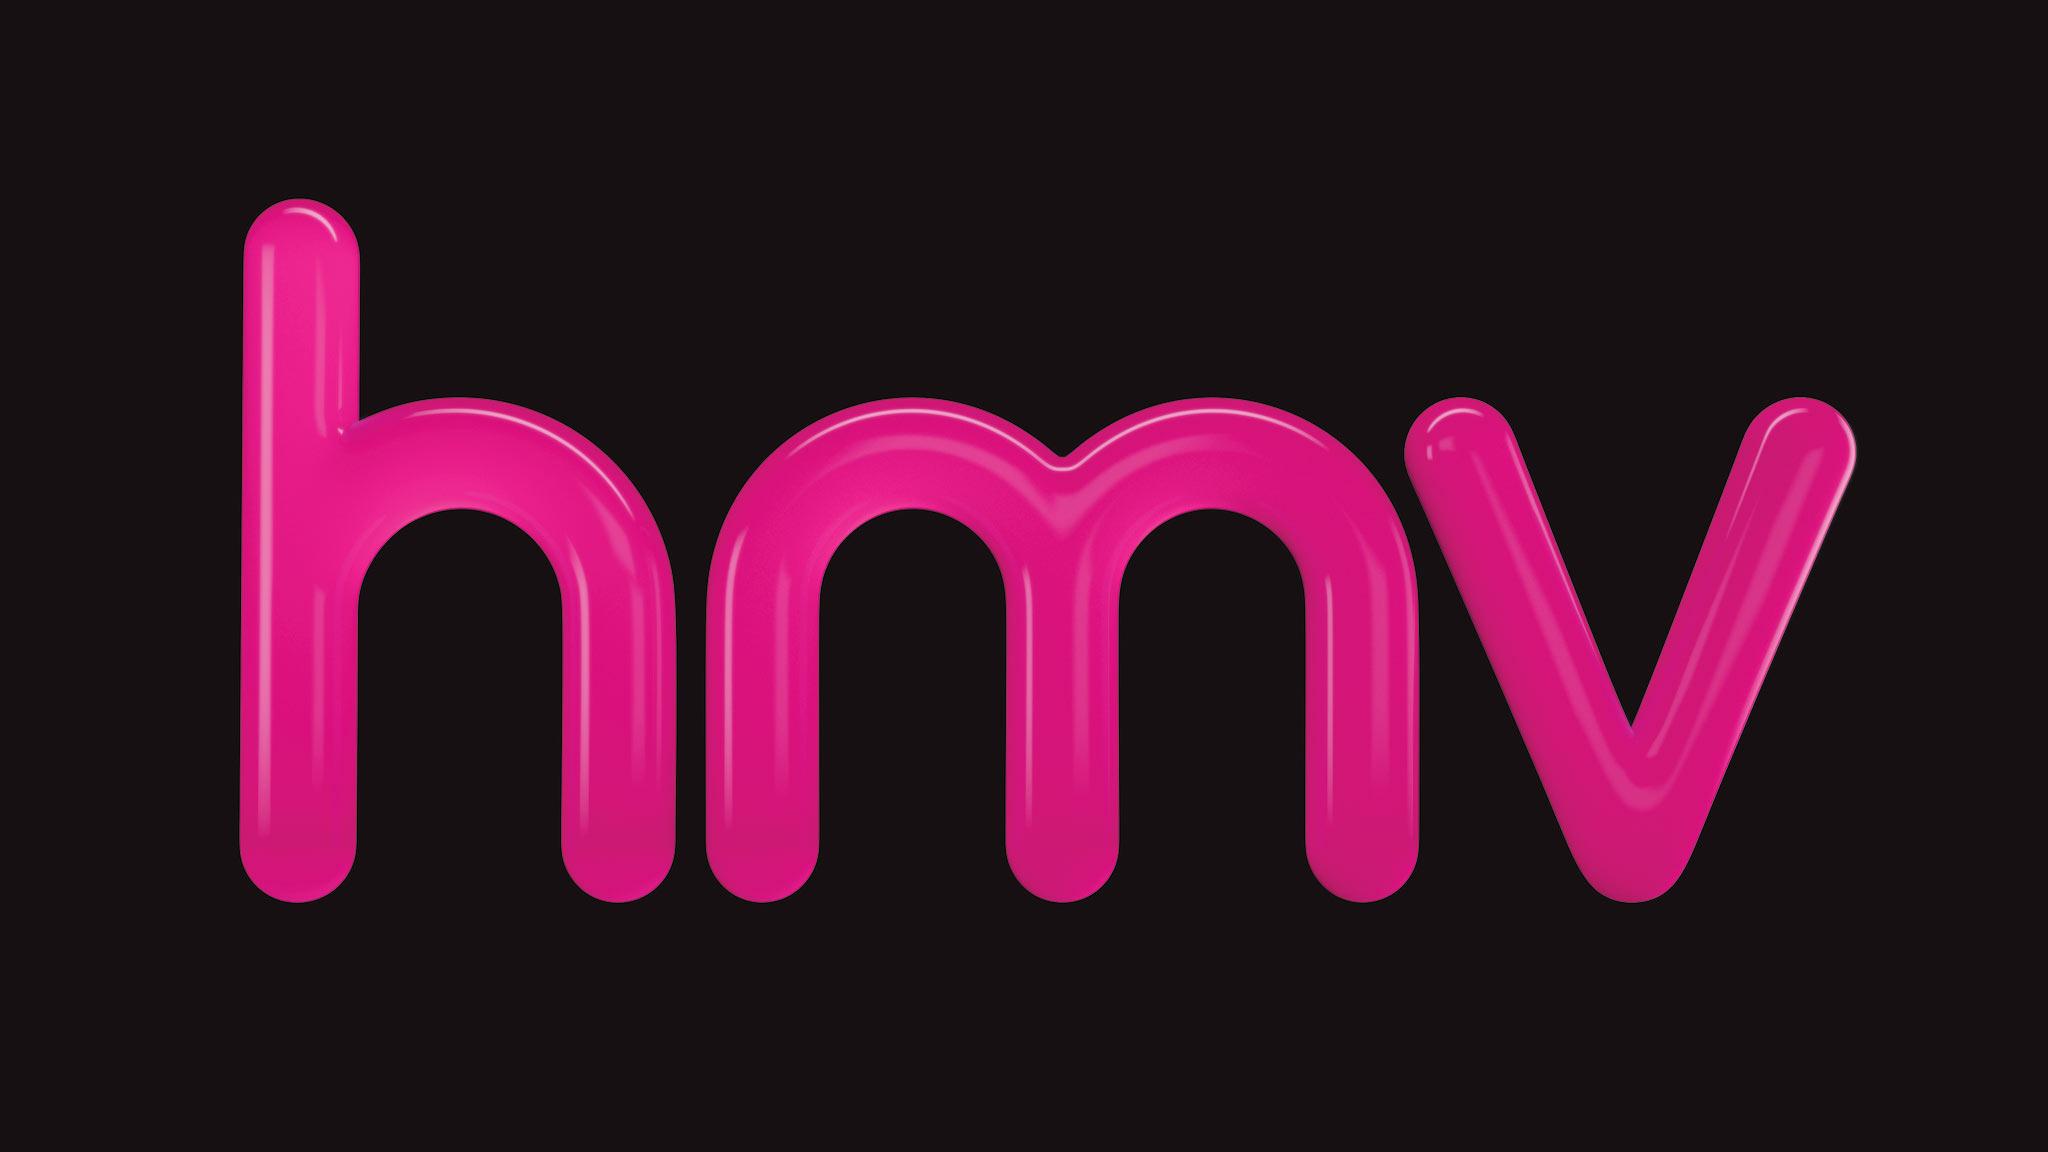 The Rebranding Of Hmv Financial Times